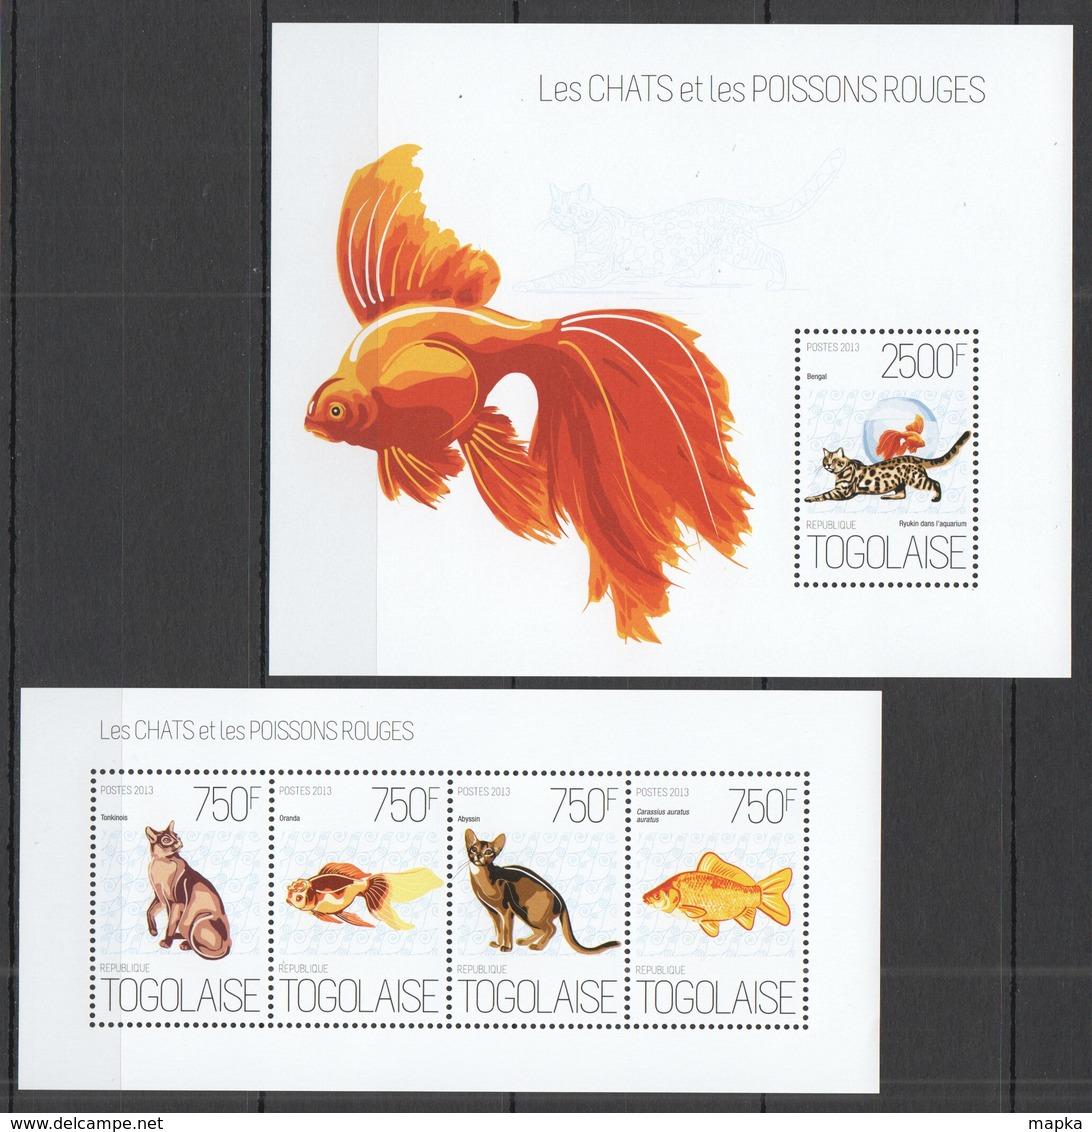 WW249 2013 TOGO TOGOLAISE FAUNA PETS FISH & MARINE LIFE CATS & GOLDFISHES KB+BL MNH - Chats Domestiques